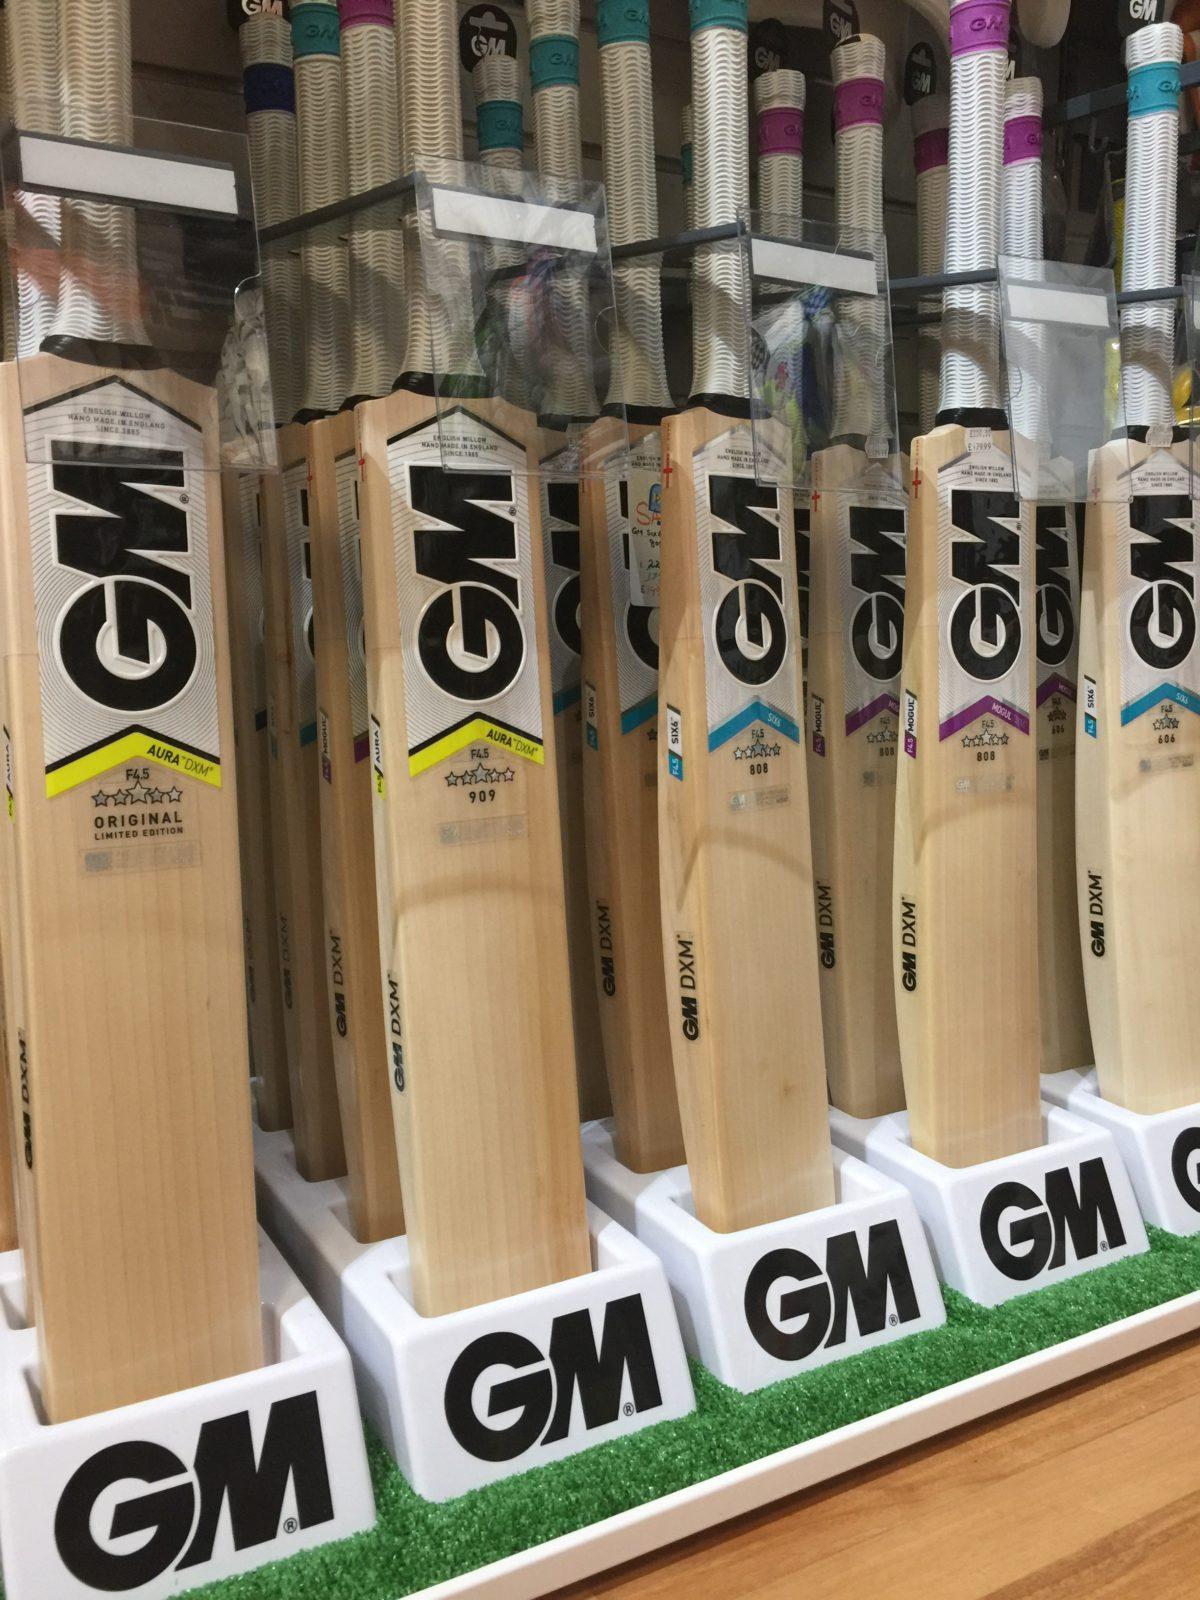 How To Choose A Cricket Bat A Buyers Guide Vks Com